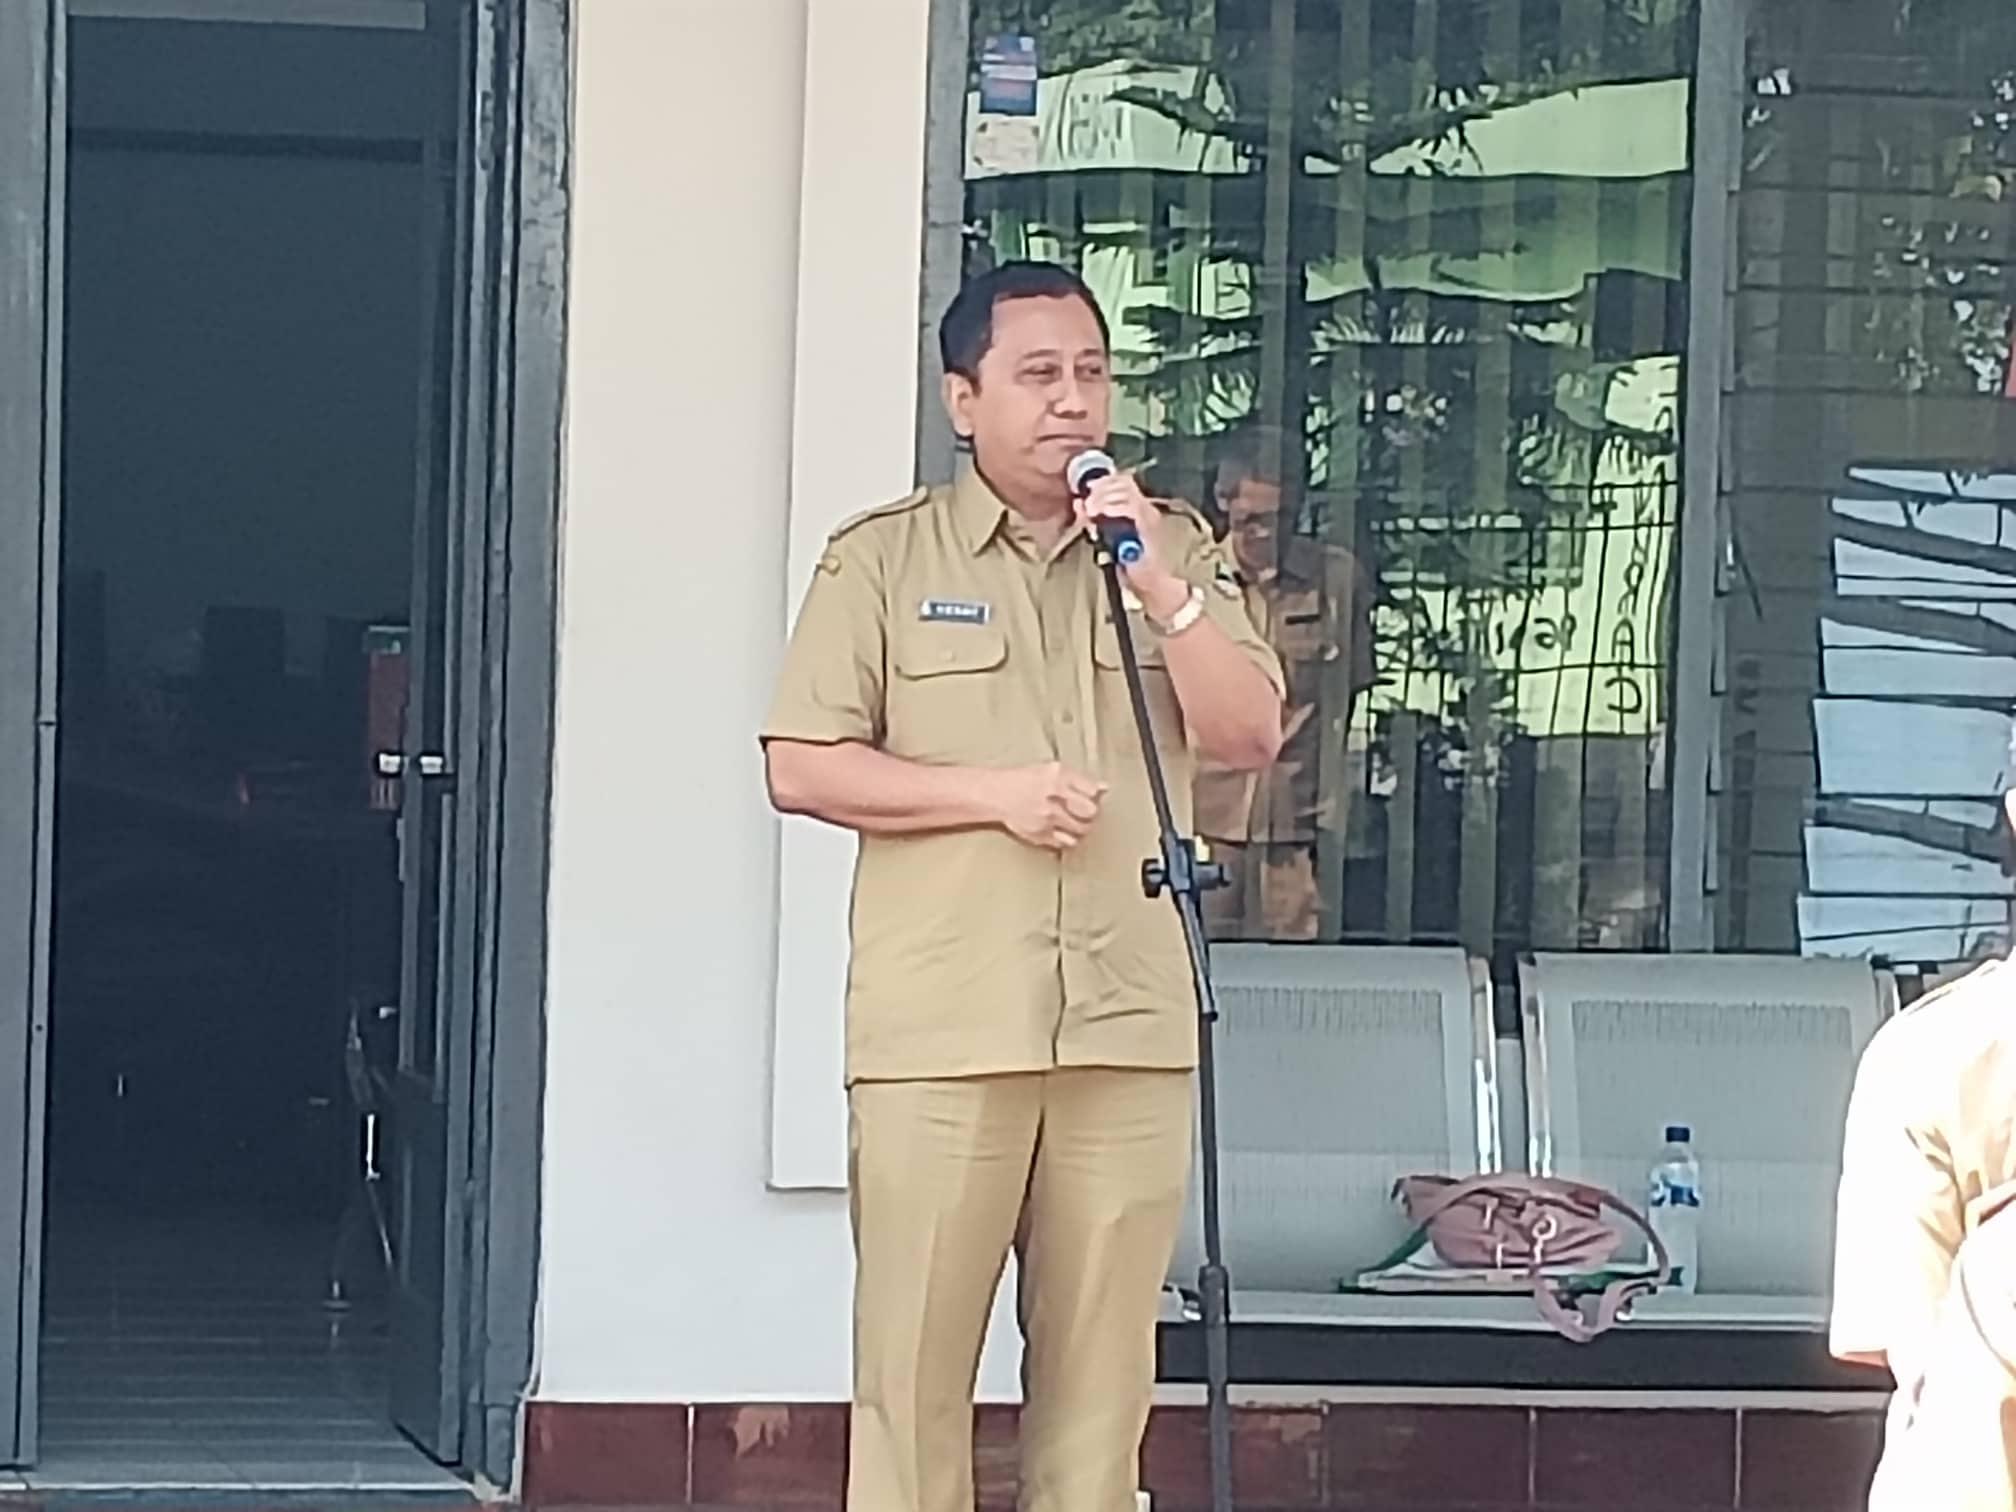 Kepala Cabang Dinas wilayah XIII, Herry Pansila memberikan arahan pada apel pagi, Selasa (10/12/19)